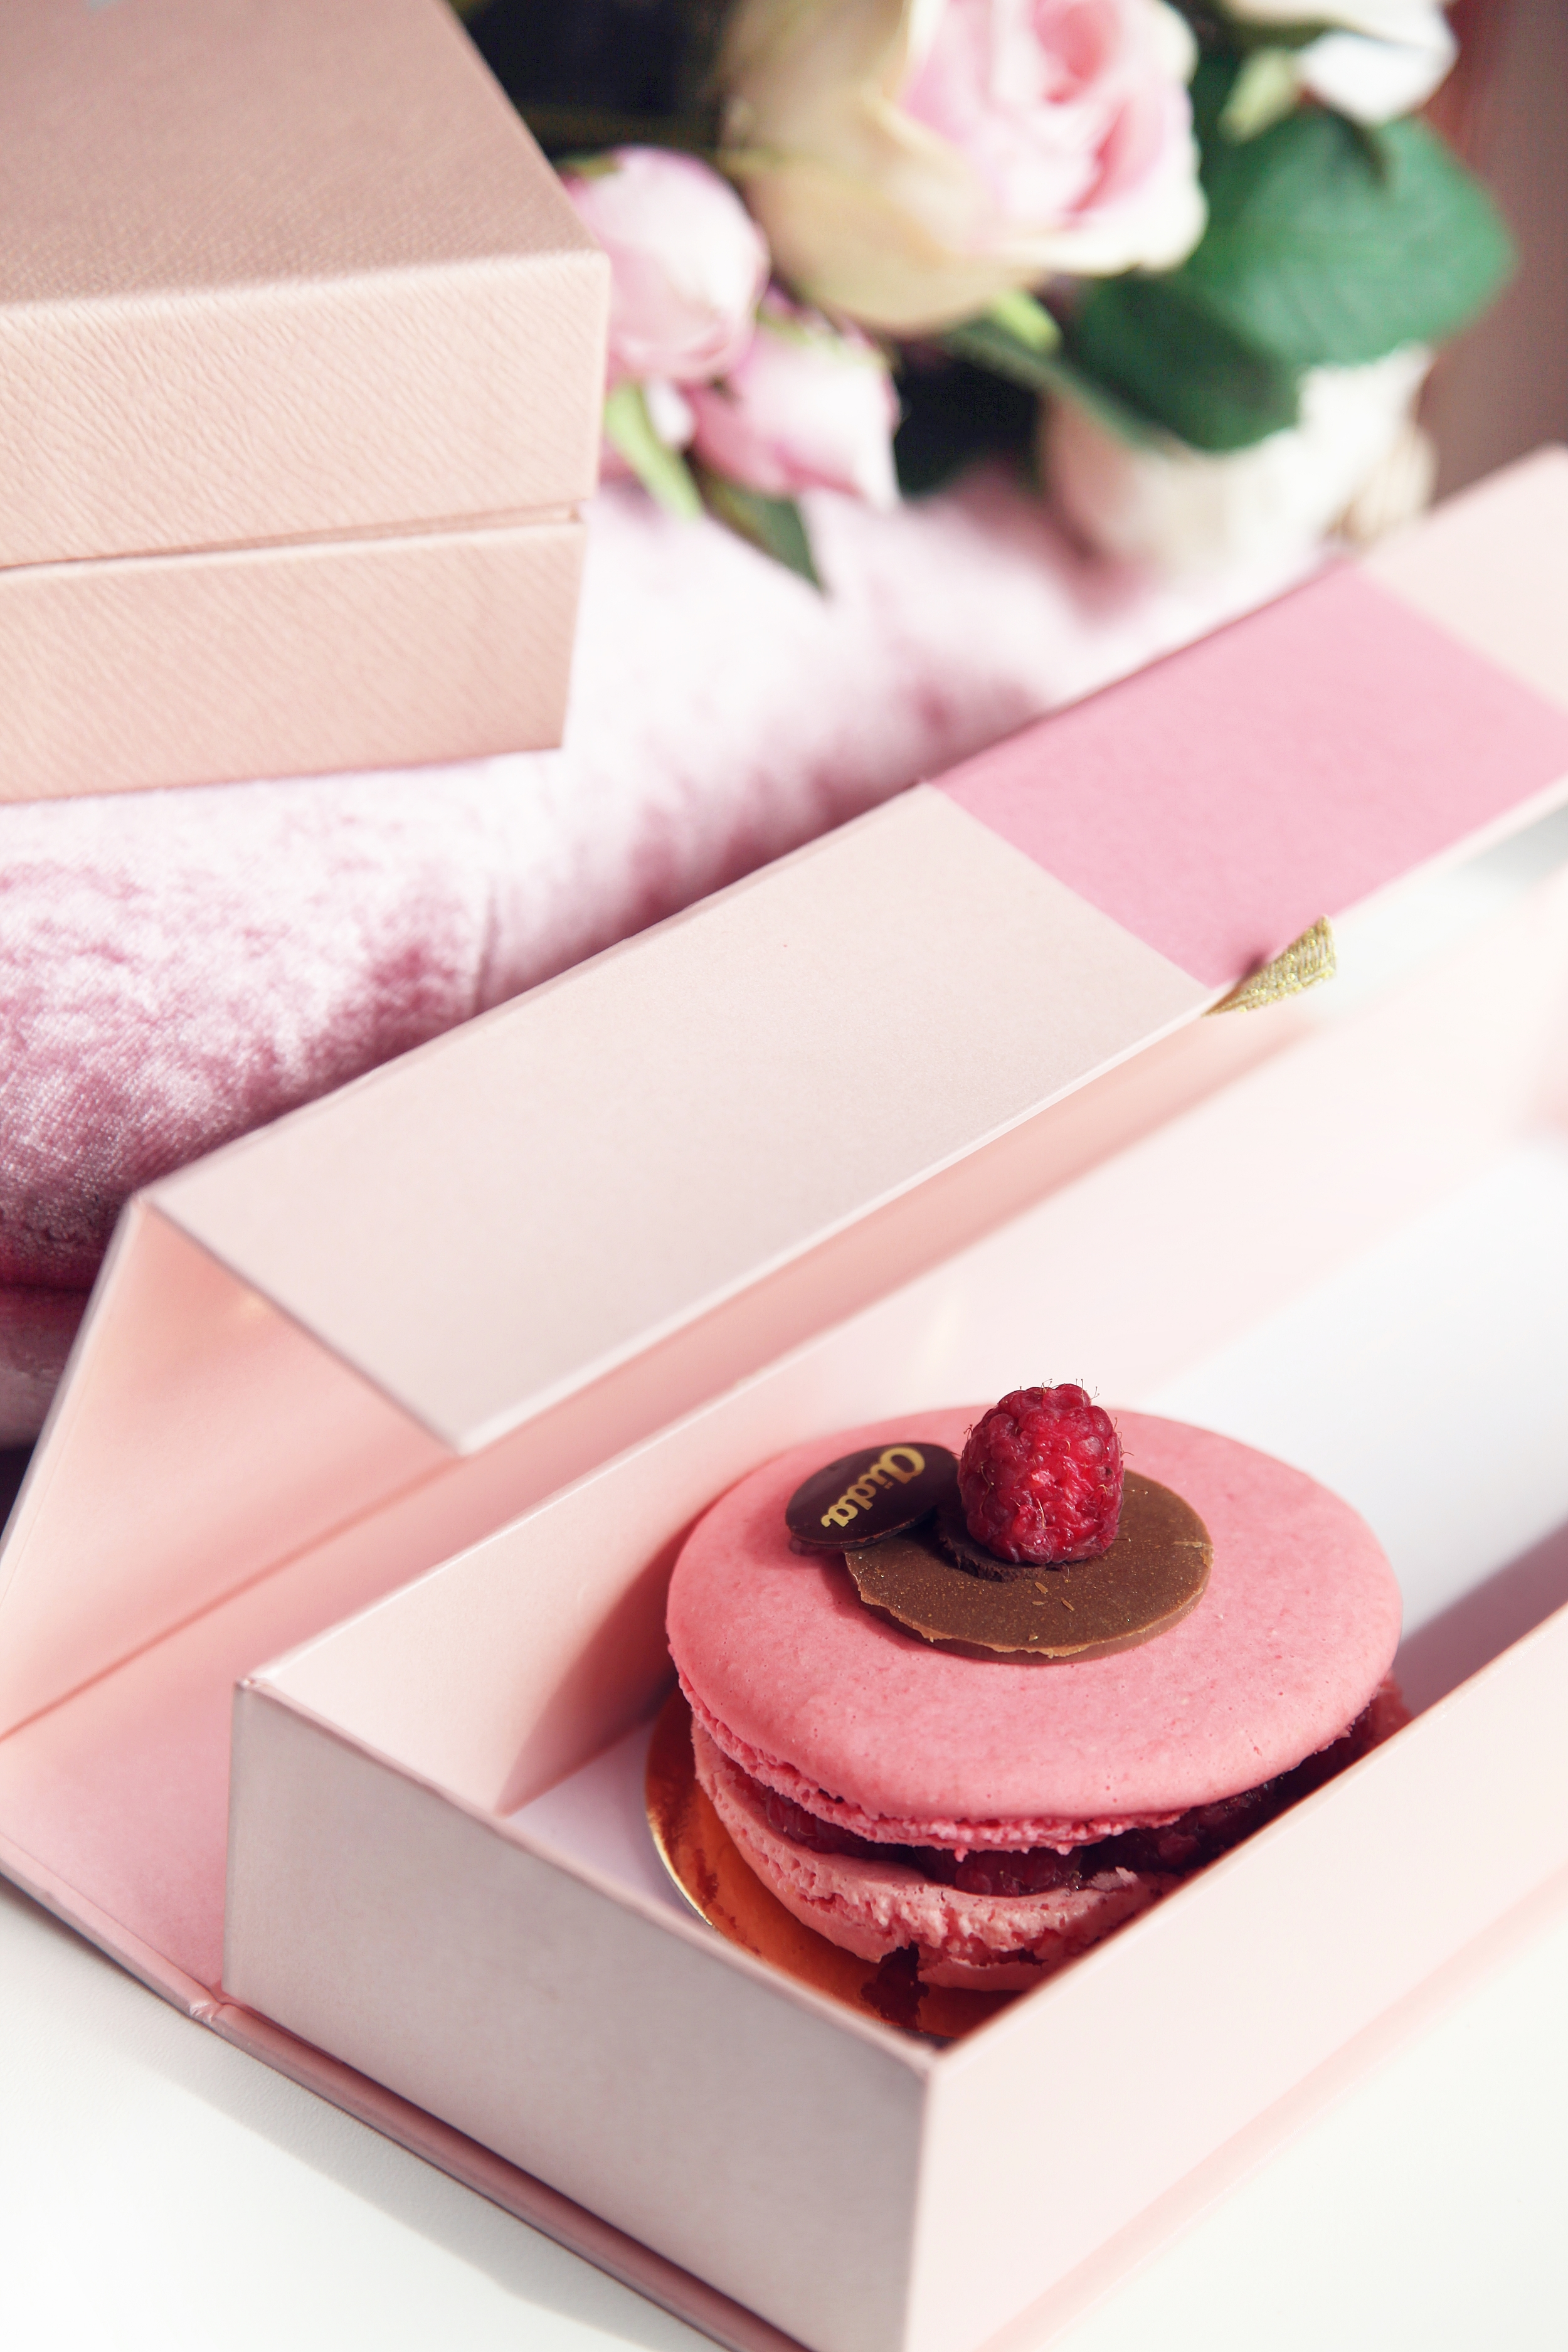 Supersized Pink Rasberry Macaron - Dyrogue